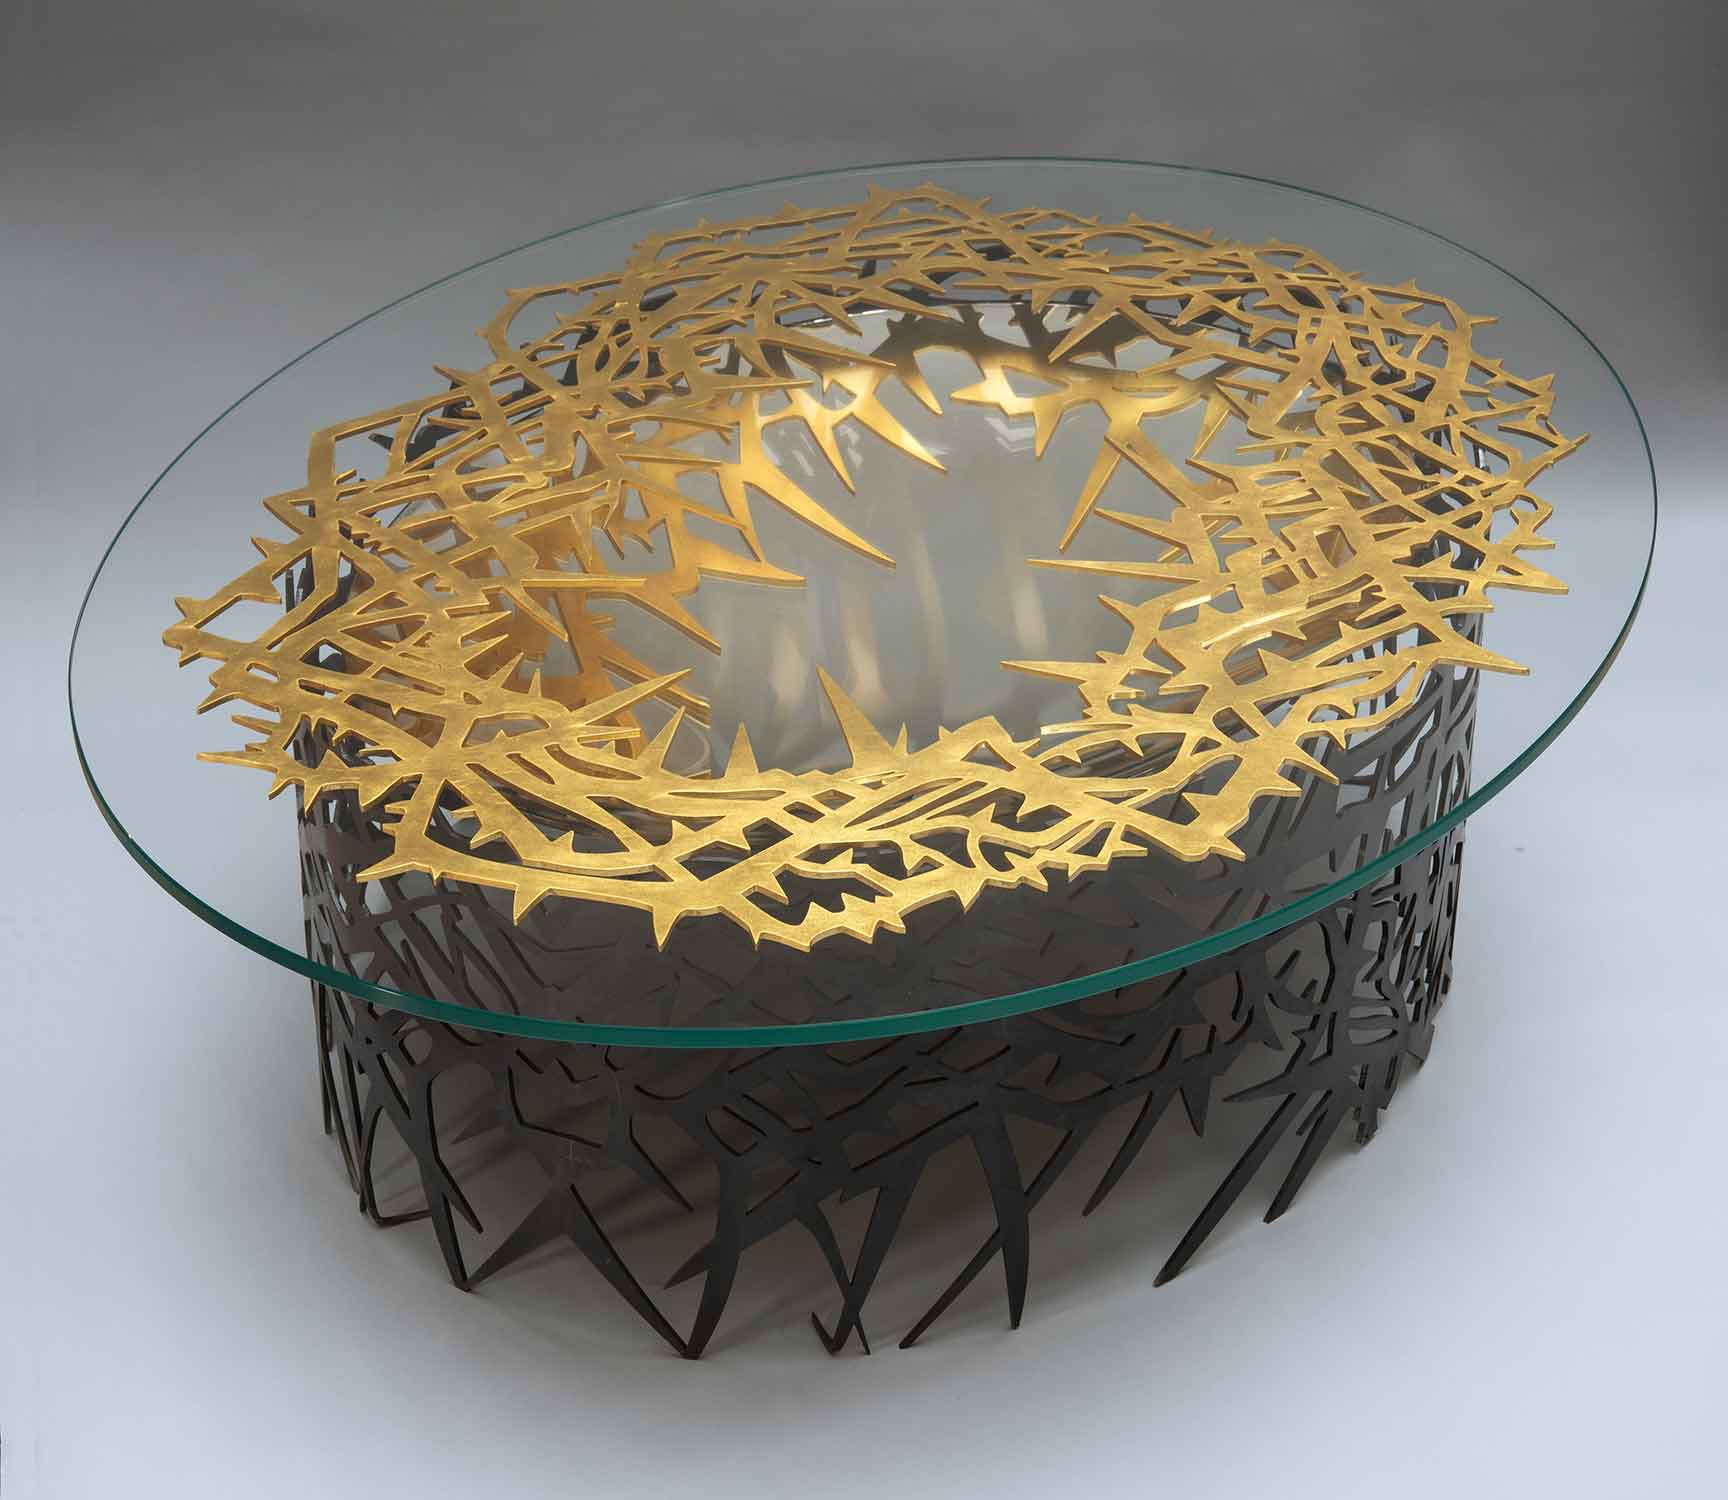 Table-couronne-d'épines-©-Sylvia-Bataill